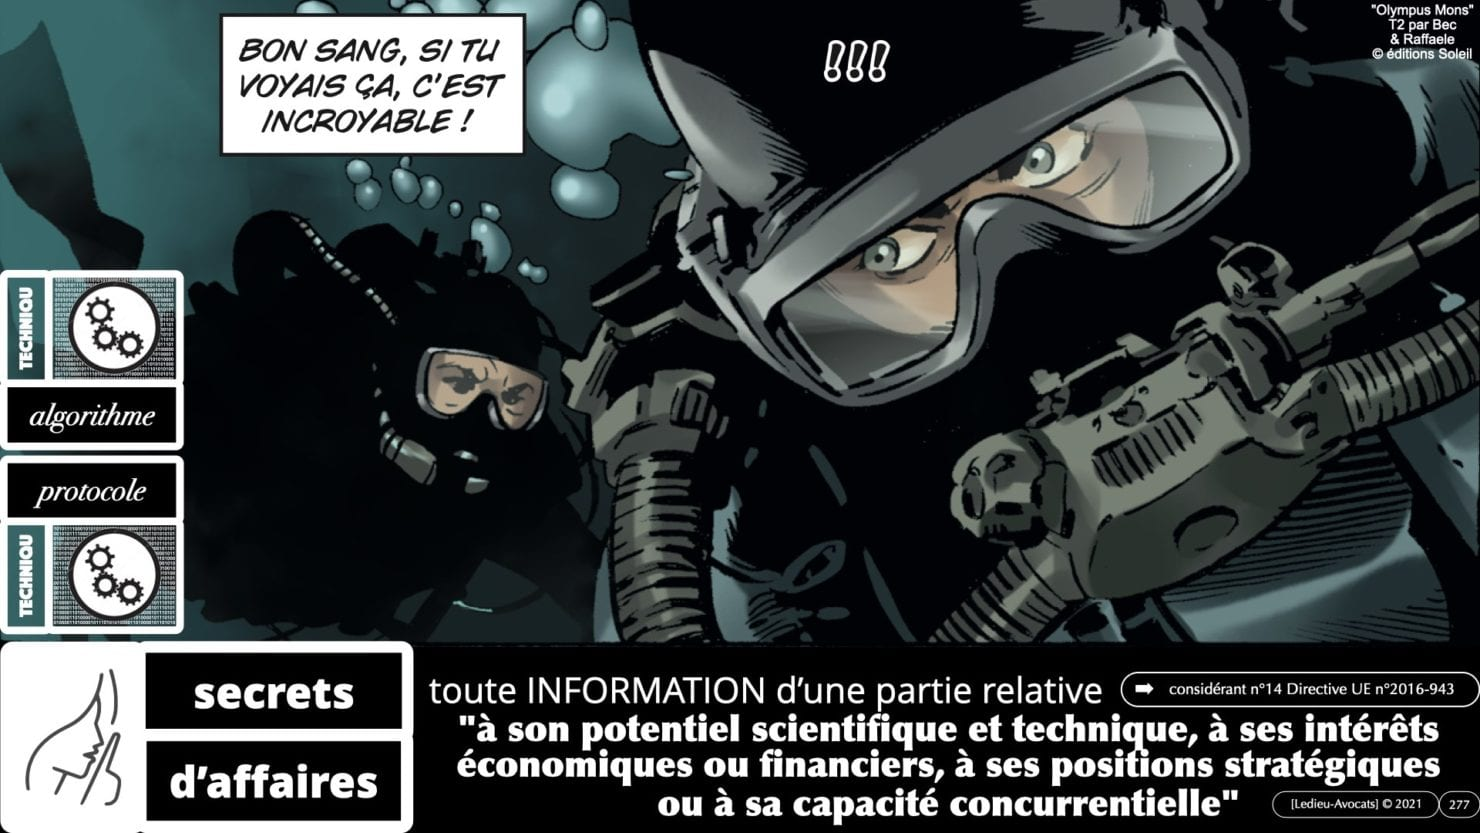 RGPD e-Privacy principes actualité jurisprudence ©Ledieu-Avocats 25-06-2021.277